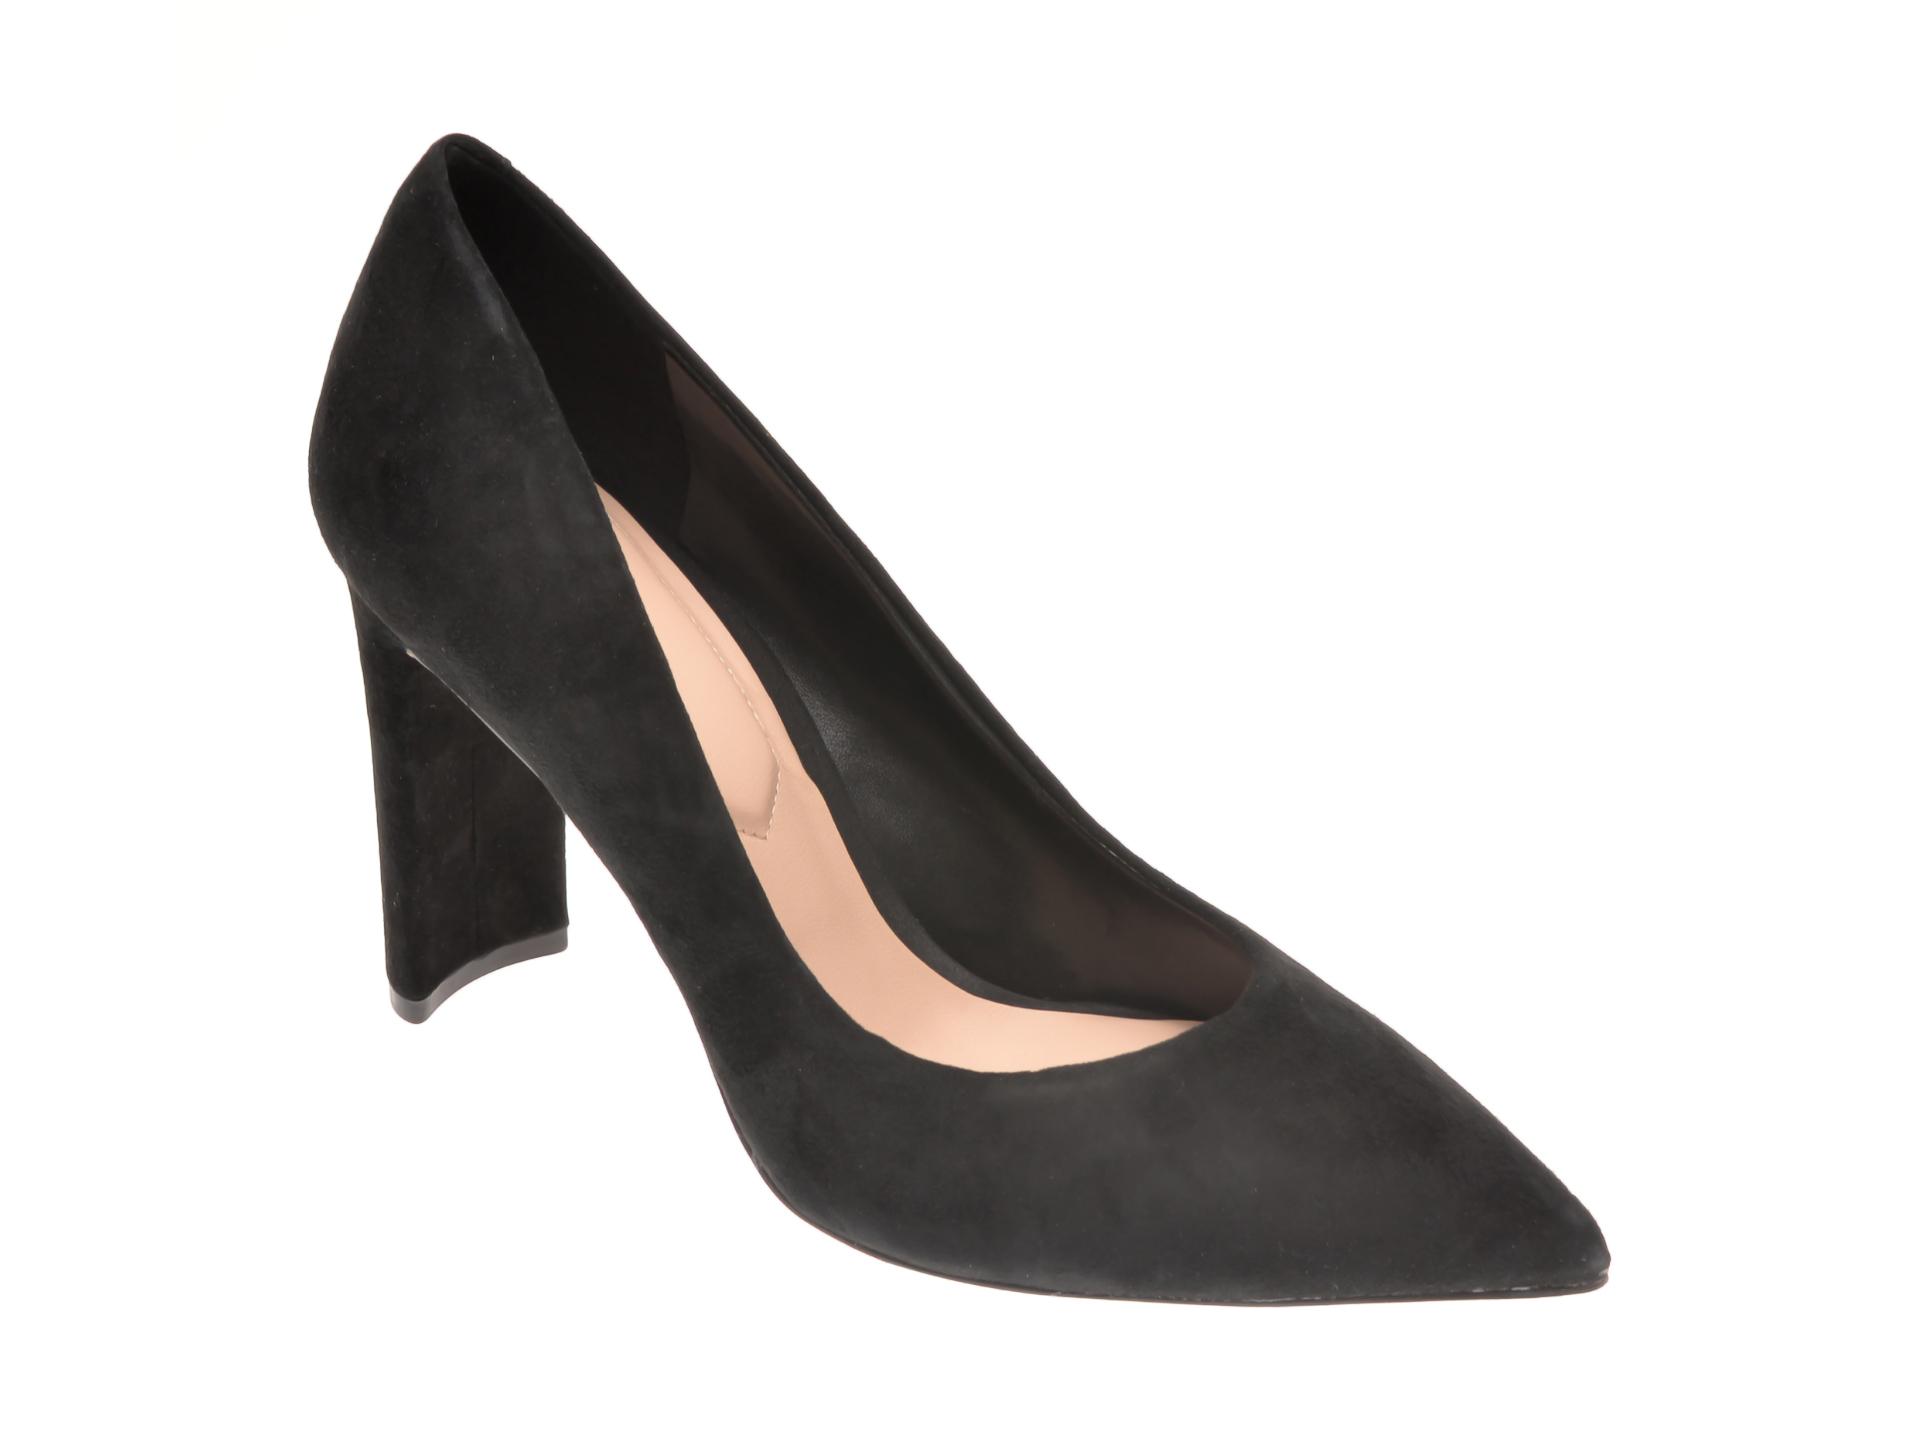 Pantofi ALDO negri, Febriclya001, din piele intoarsa imagine otter.ro